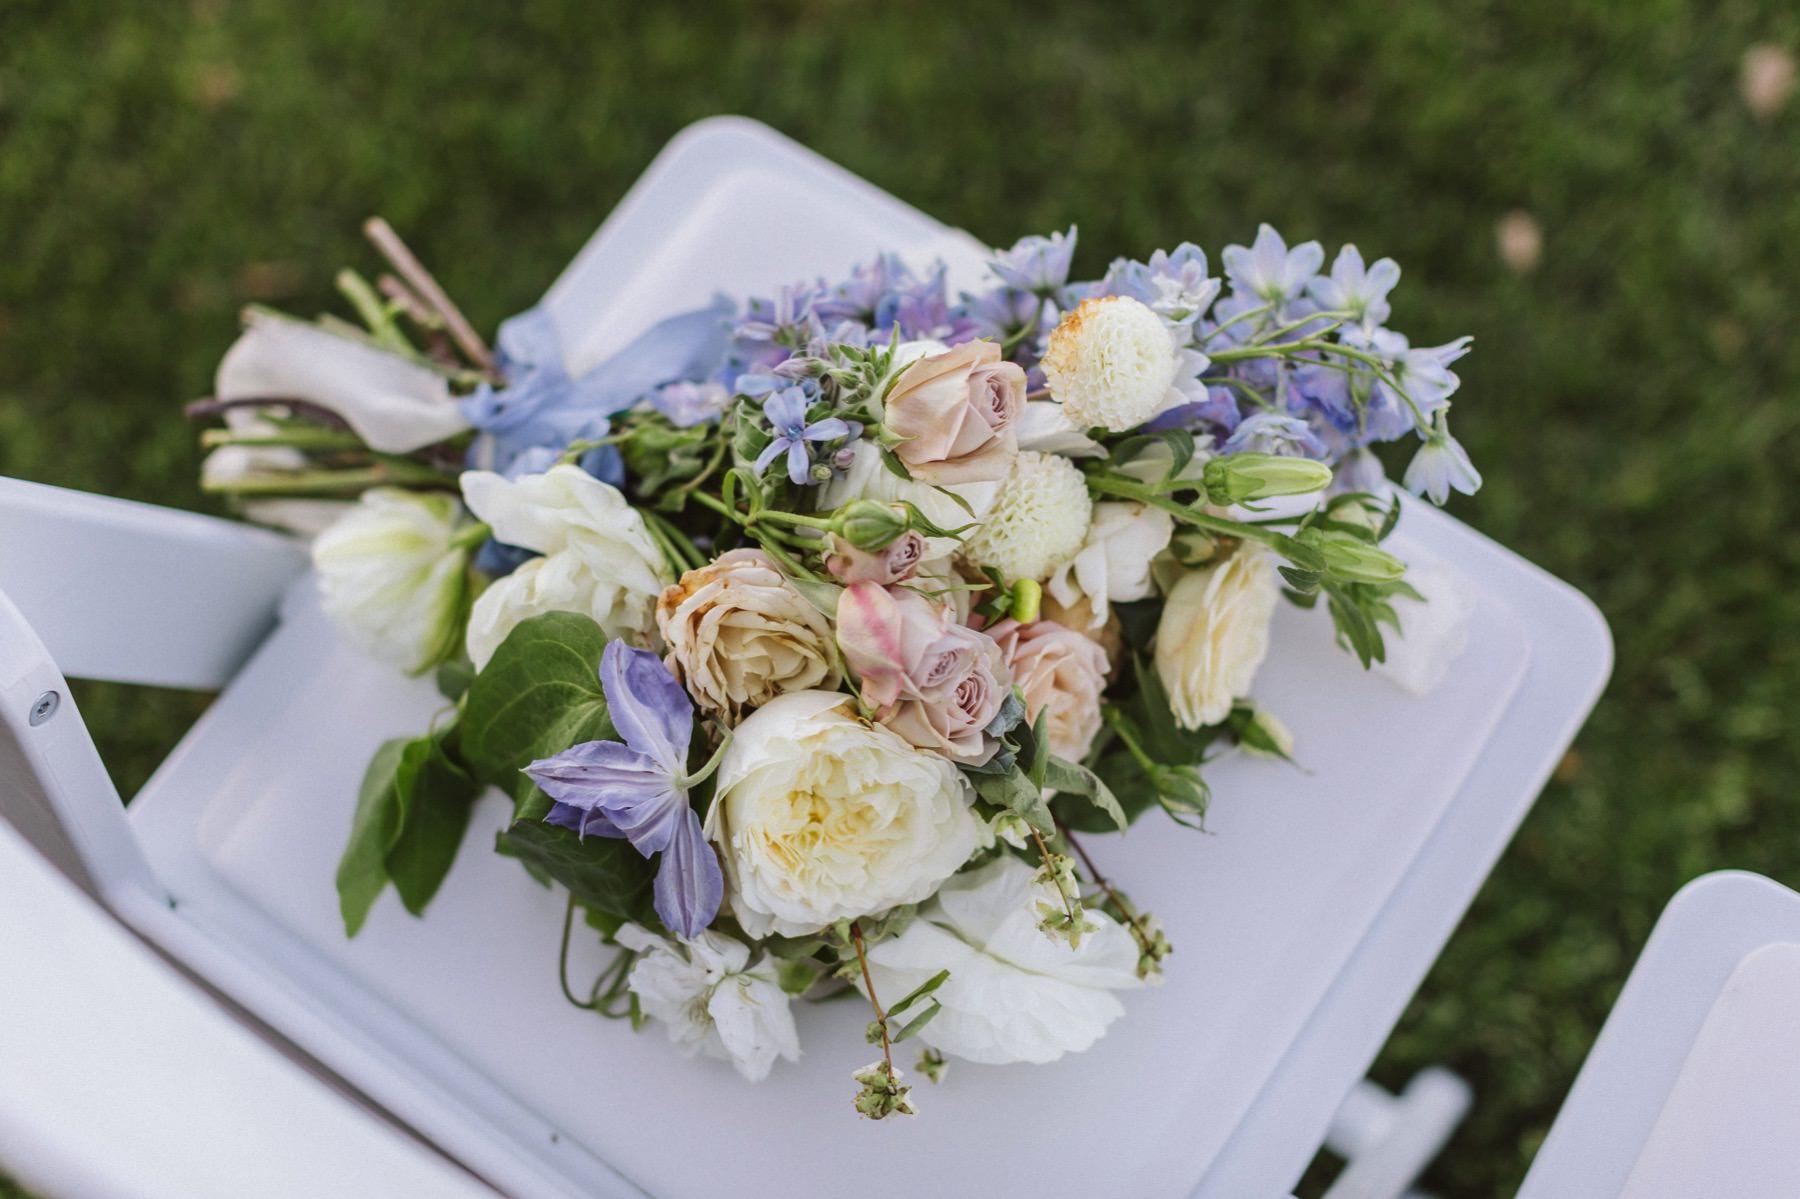 Thomas Fogarty wedding planner